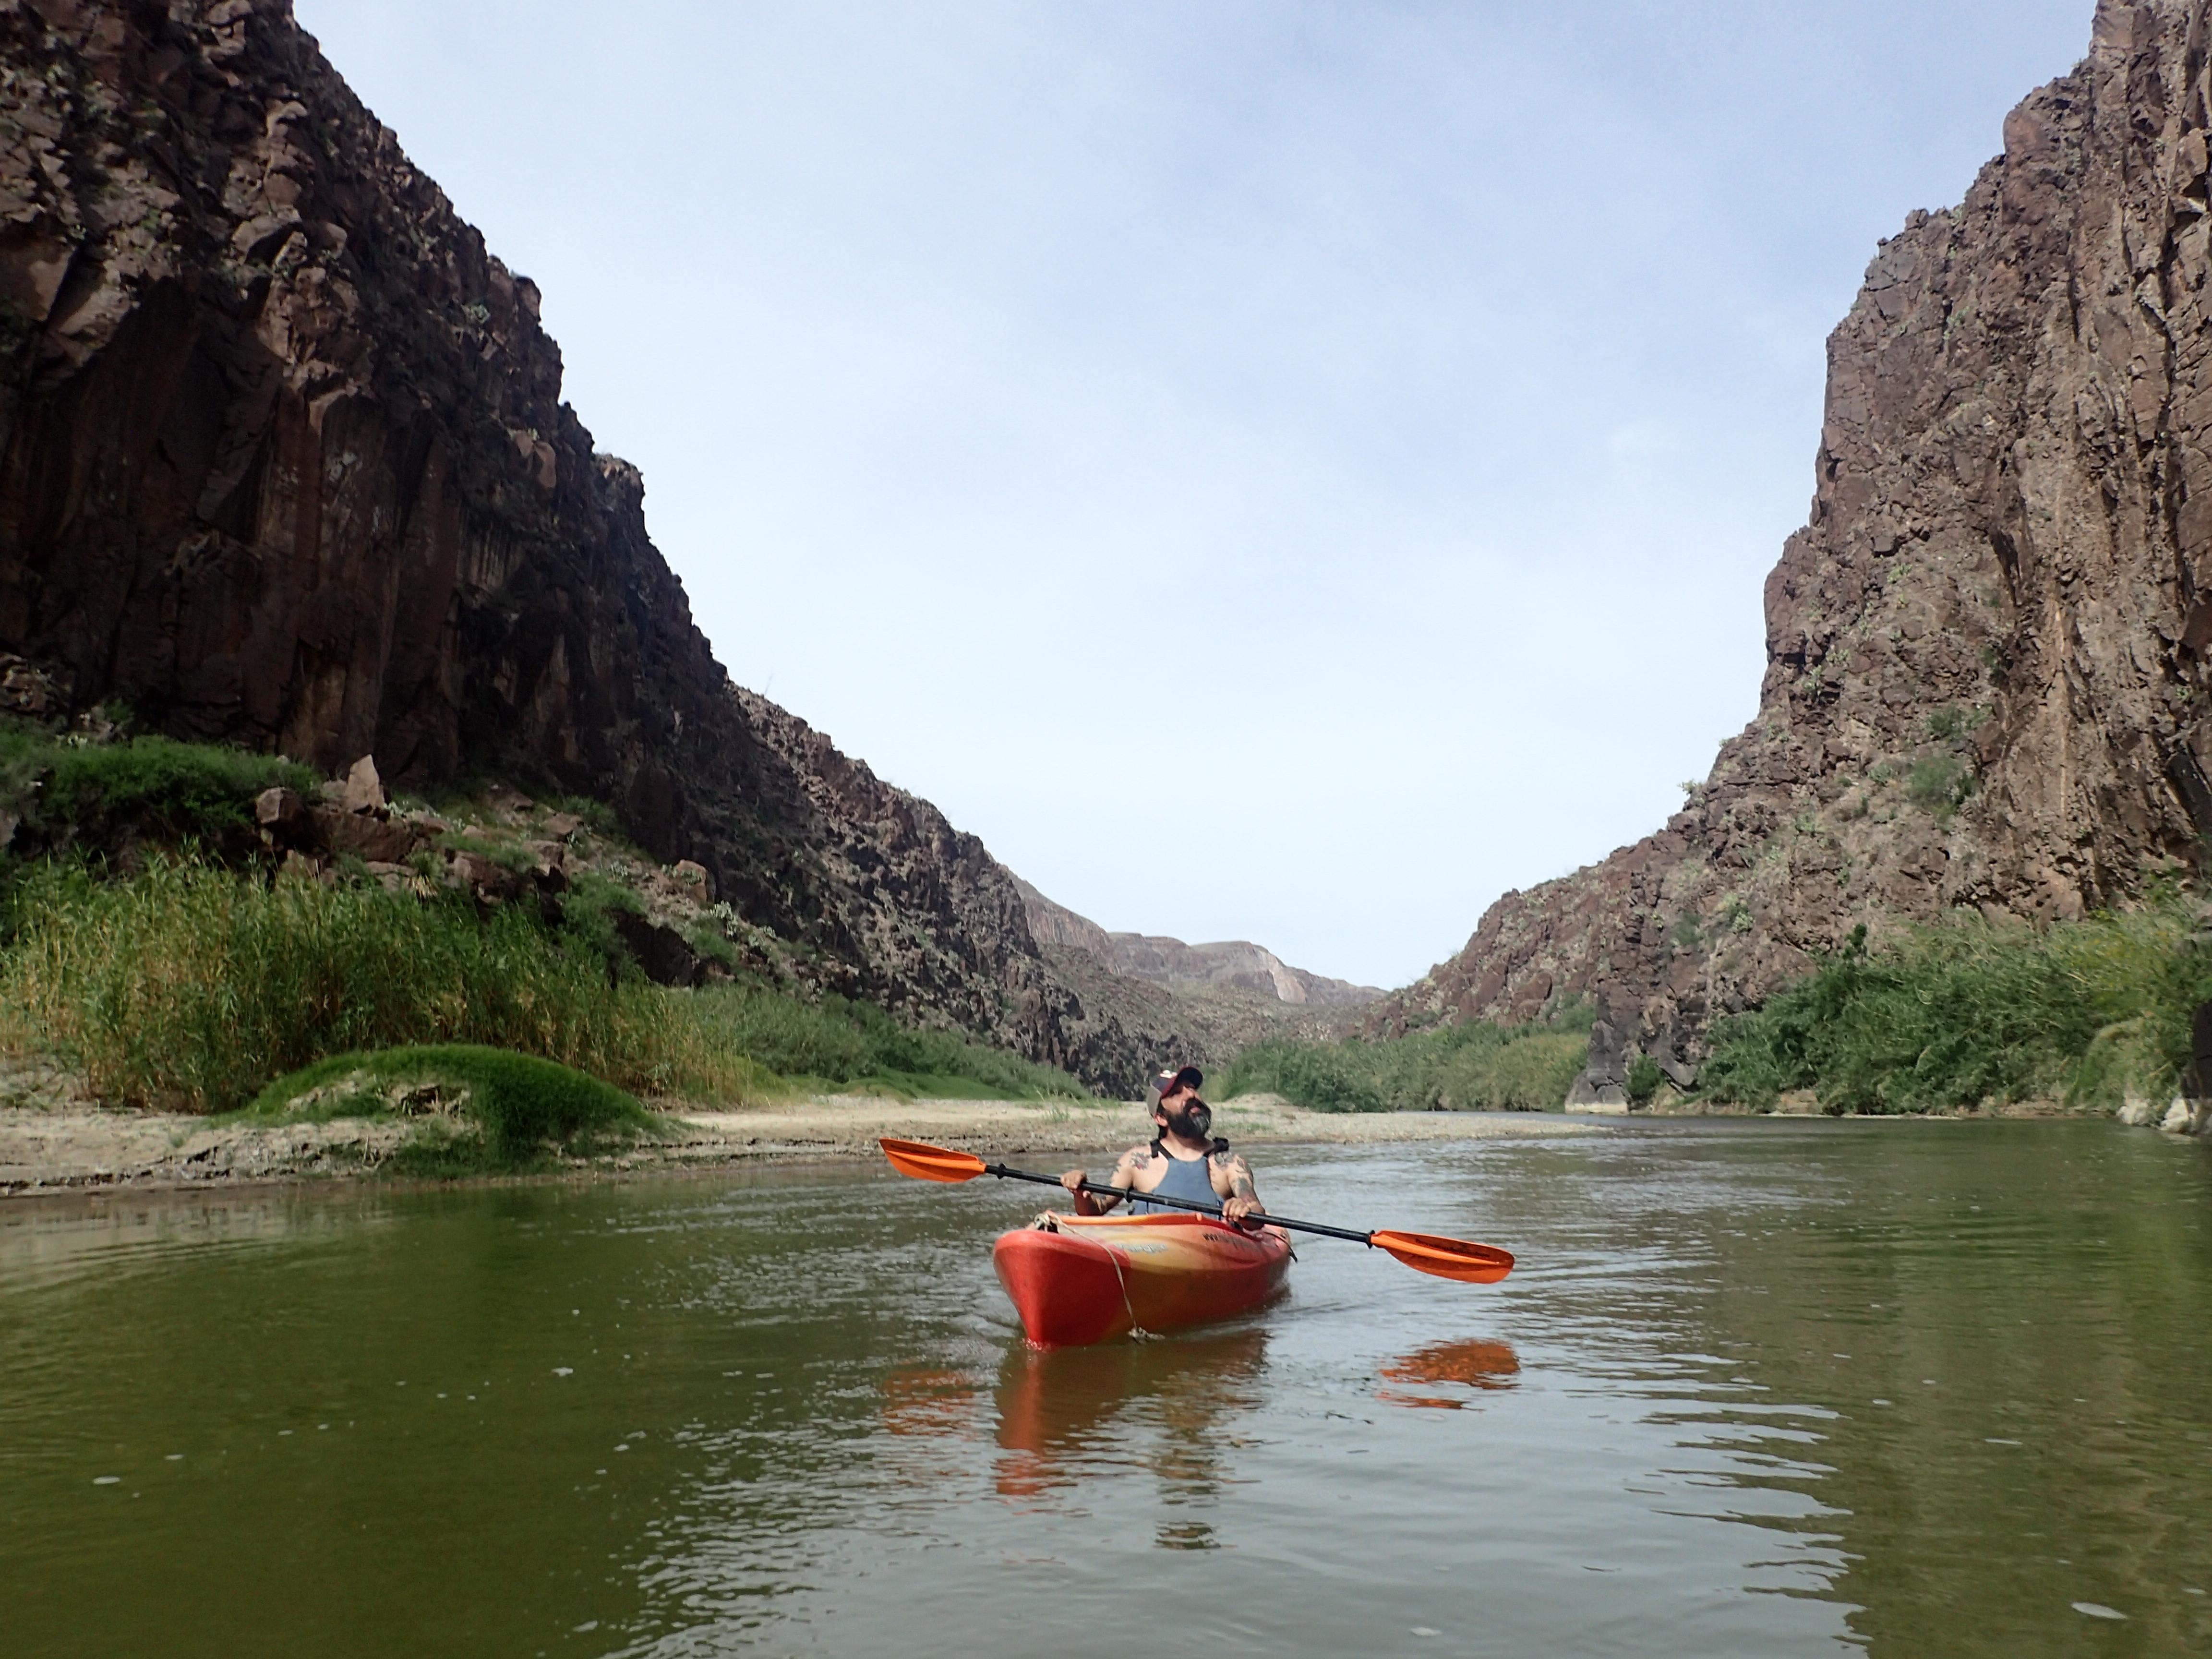 Half-Day River Trip 8:30 a.m.